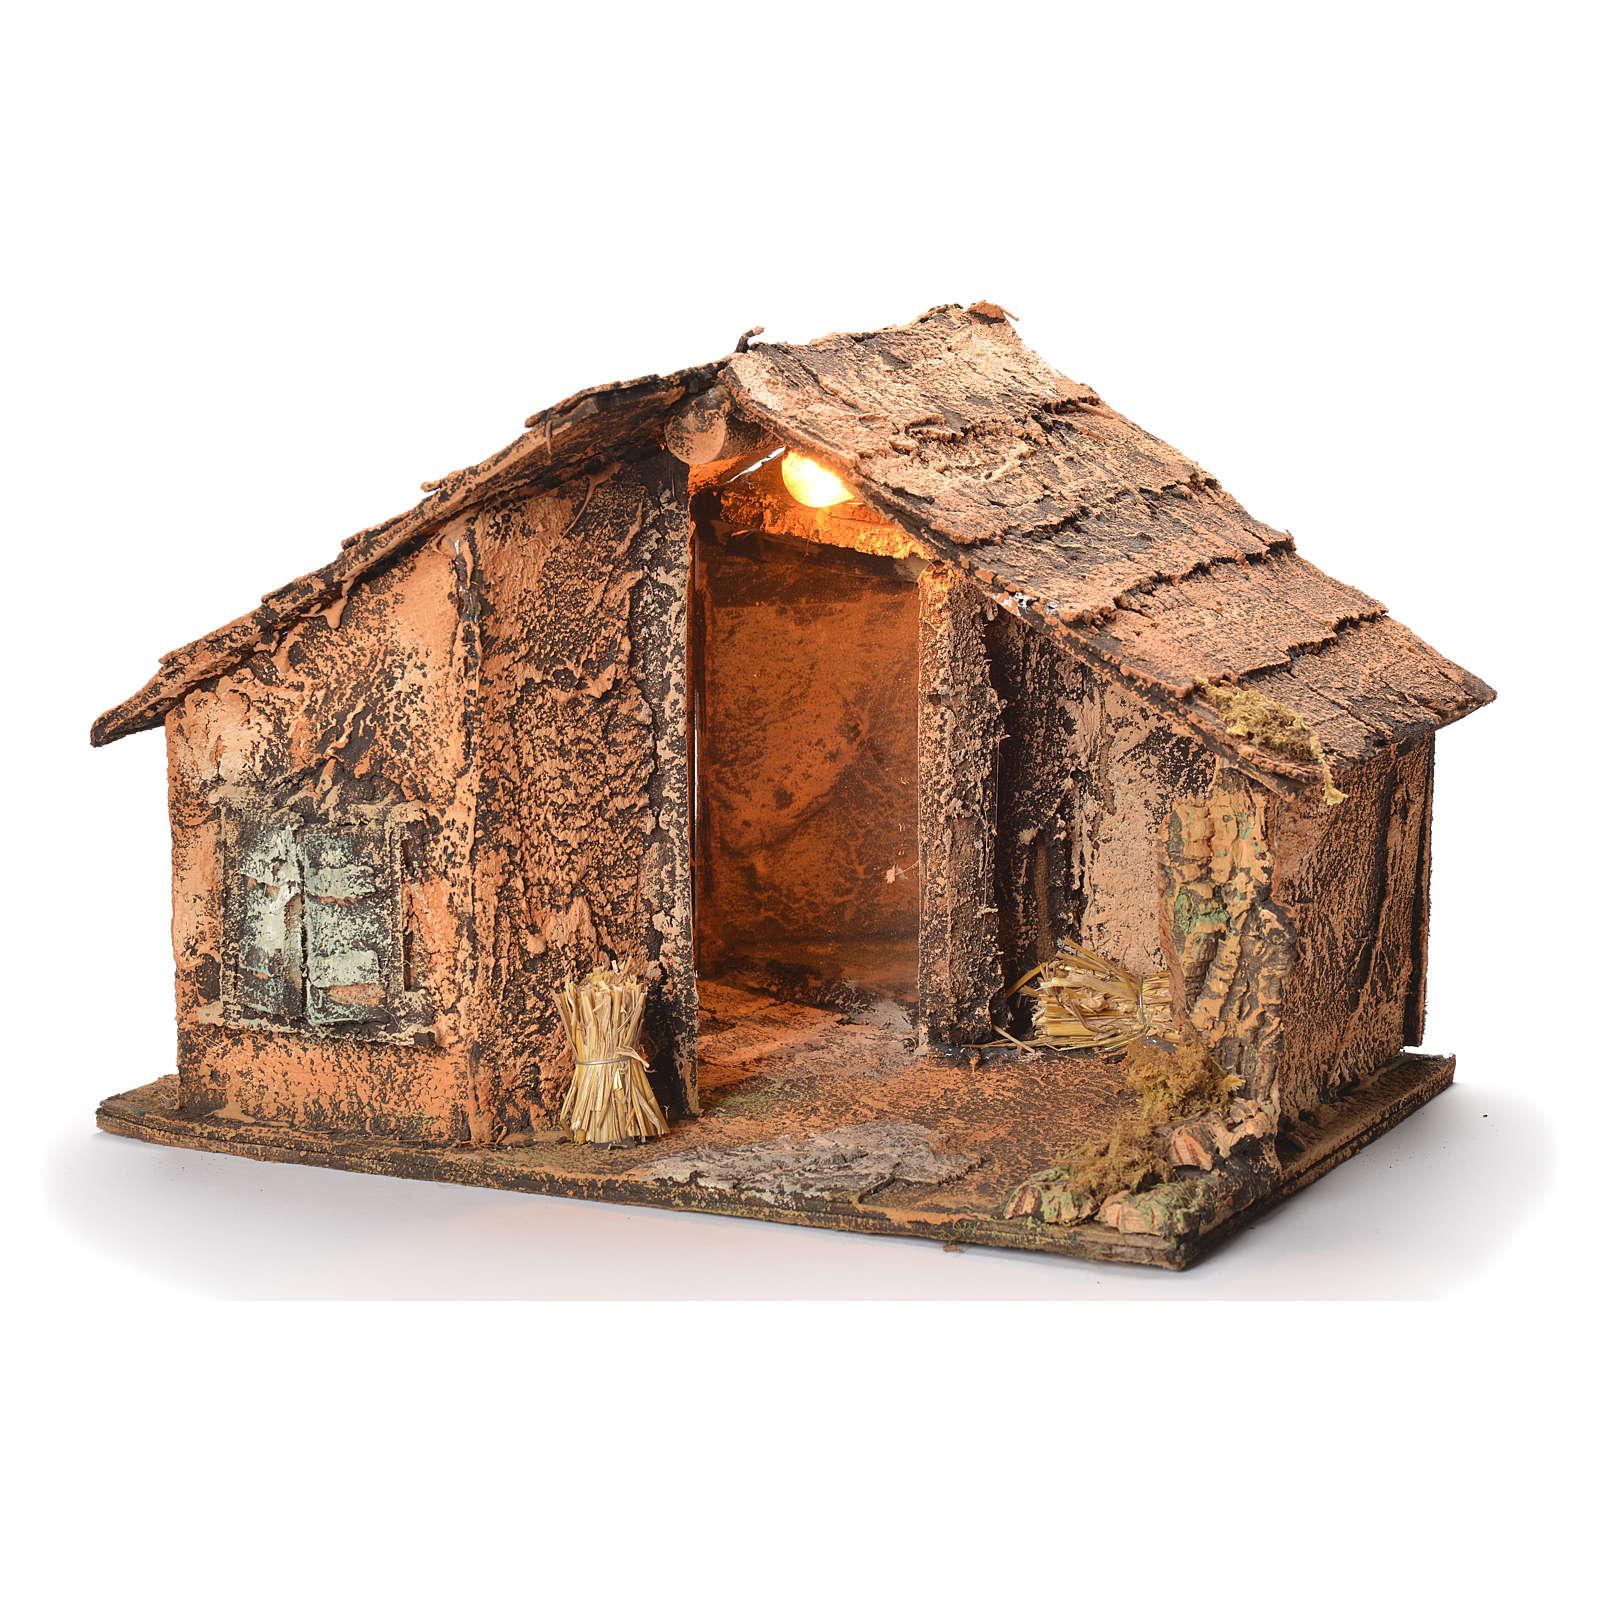 Wooden cabin with mirror, Neapolitan Nativity 45x56x45cm 4